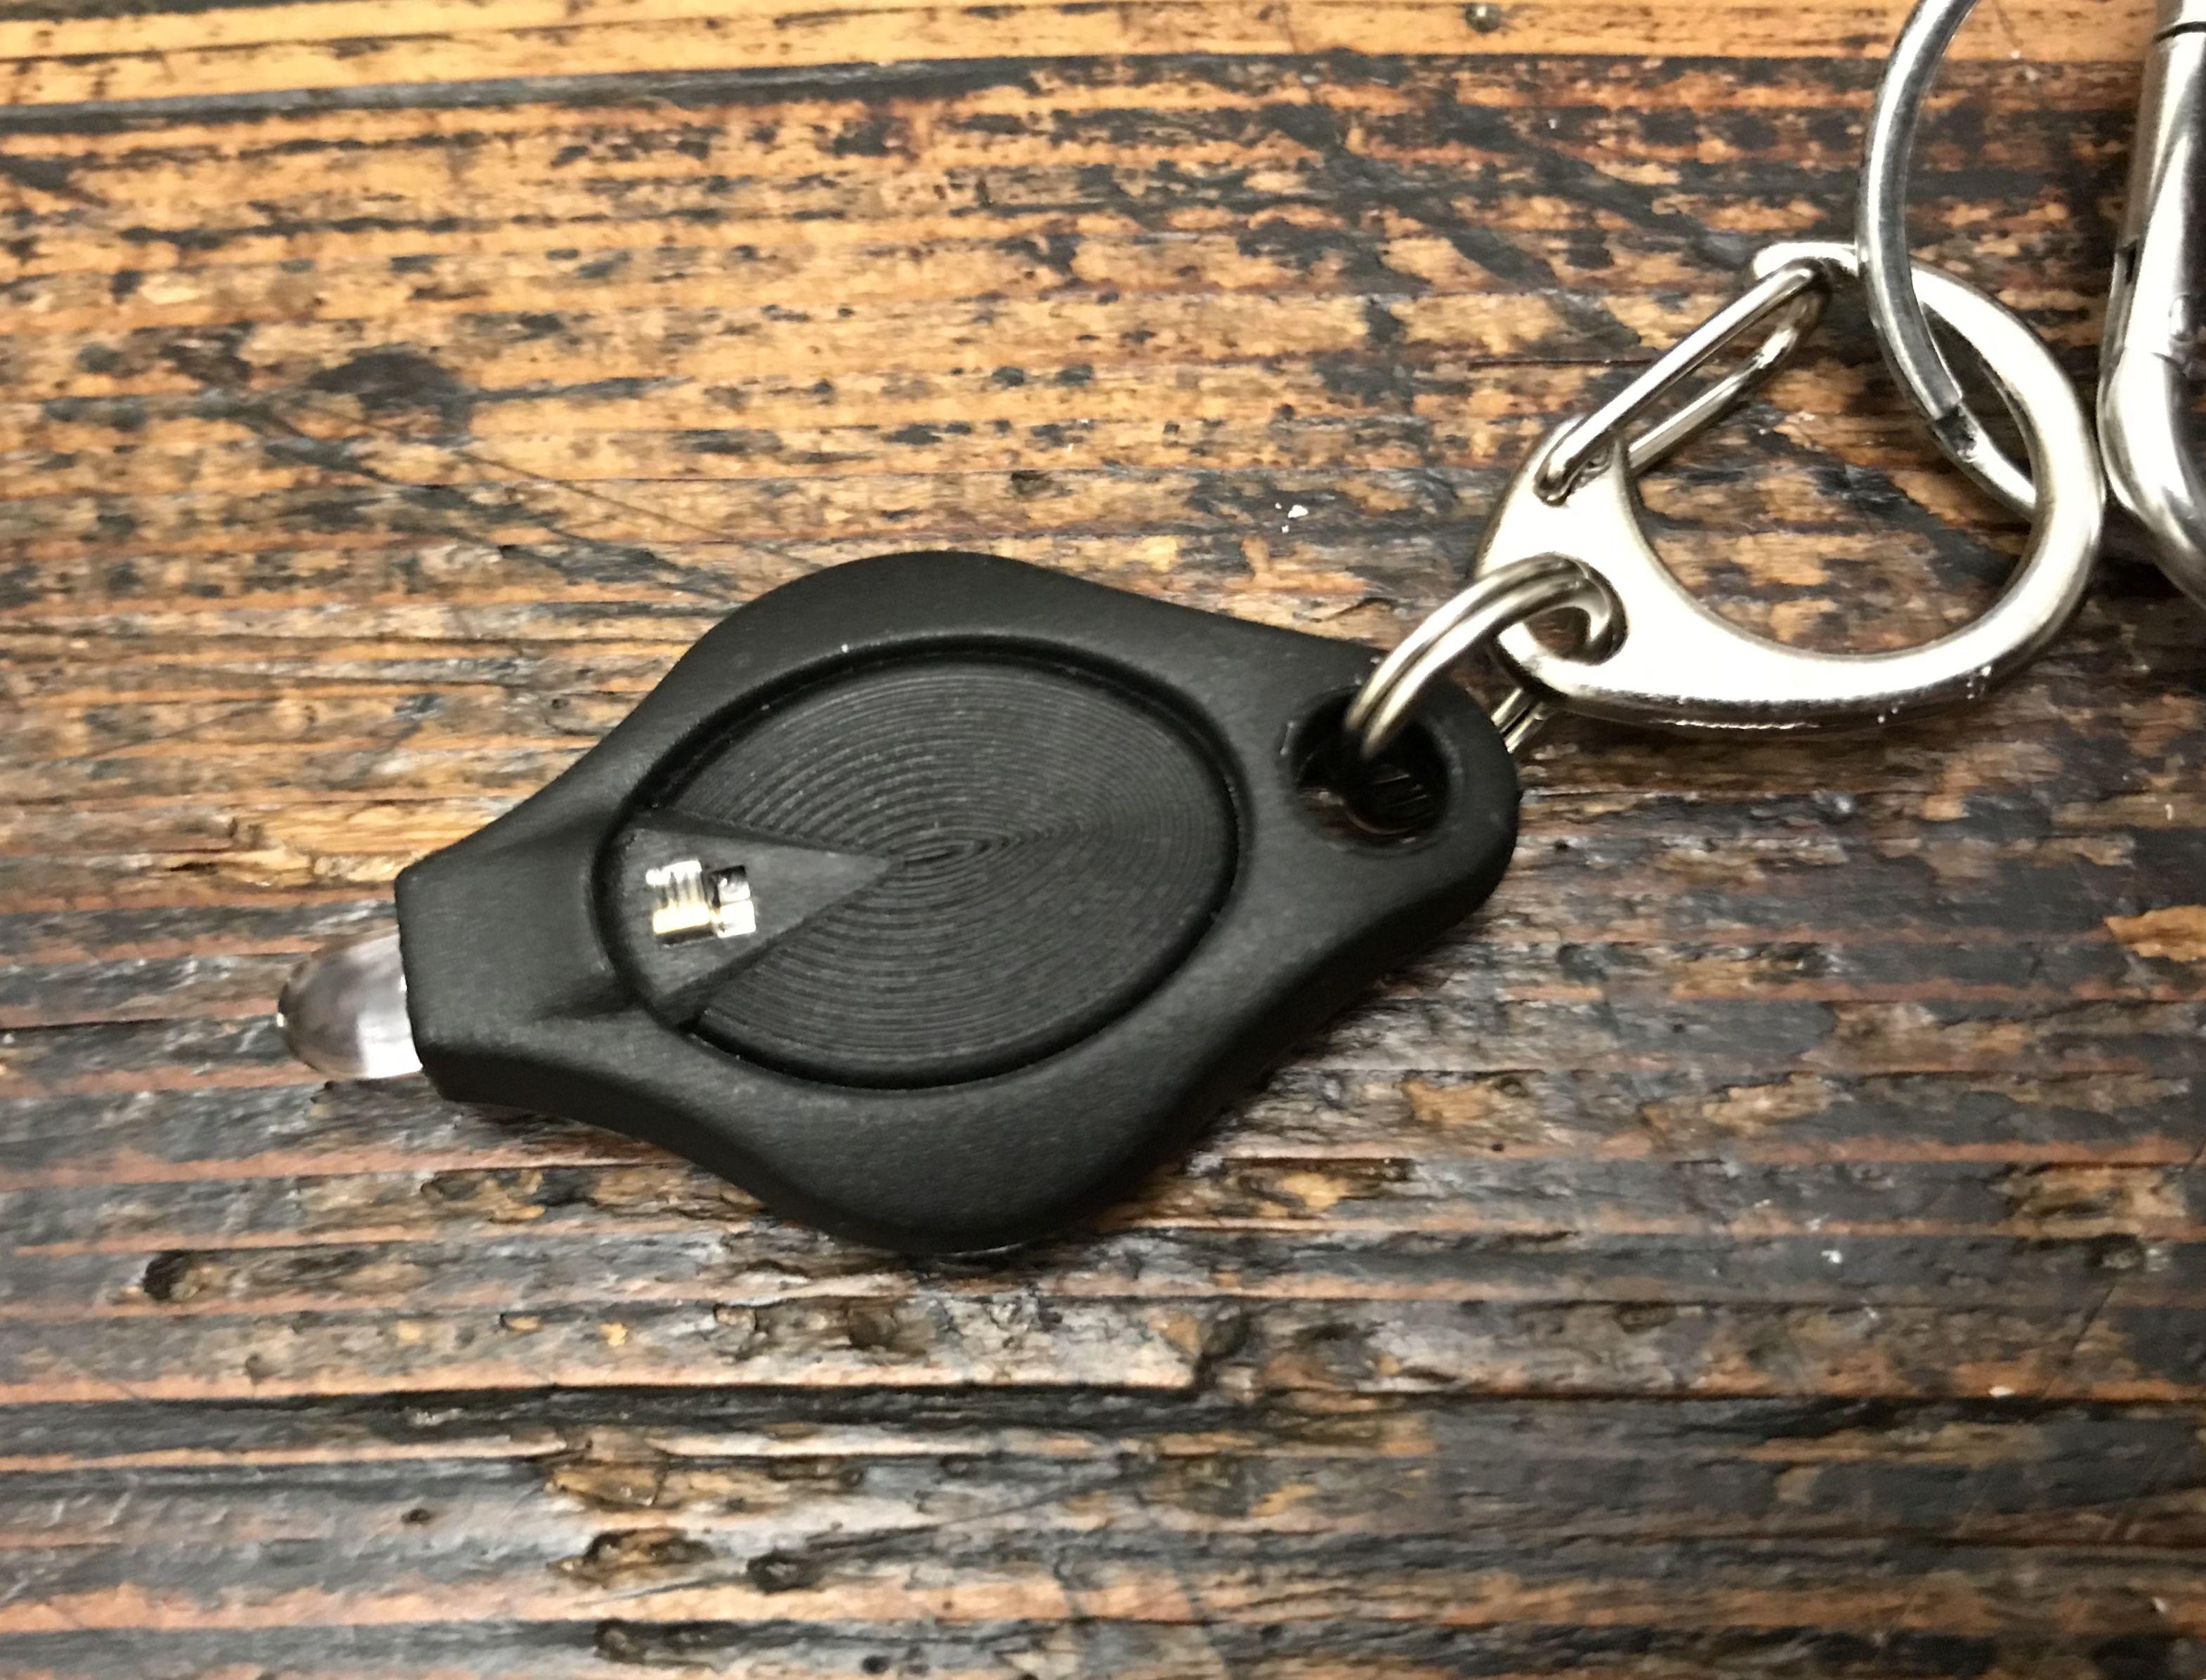 Photon Micro Light Ii Led Keychain Flashlight Led Flashlight Led Flashlight